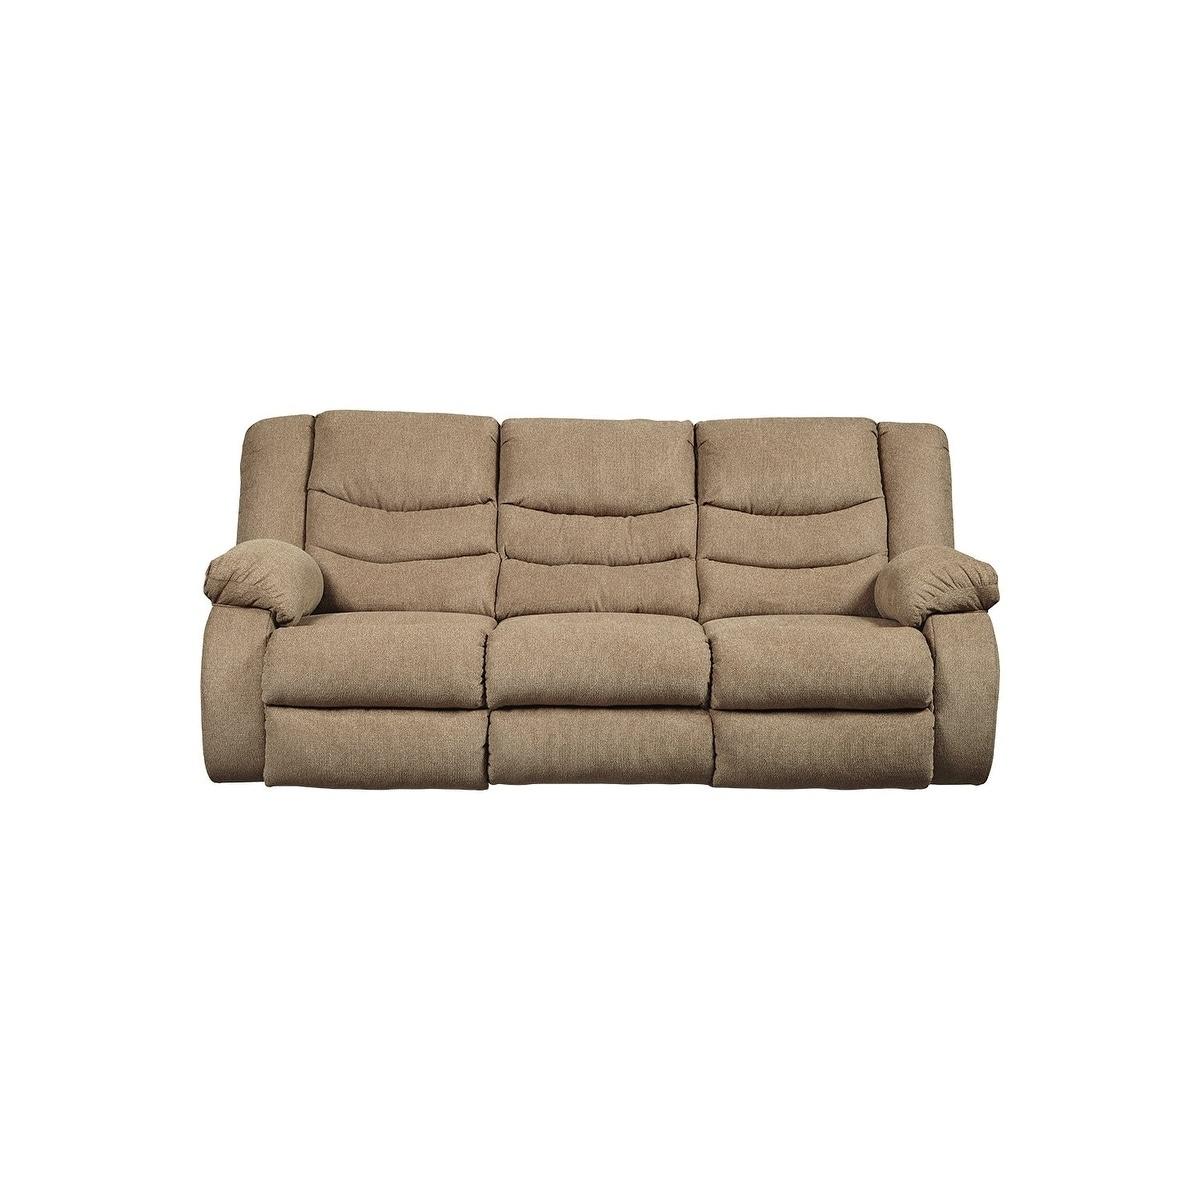 Fine Signature Design By Ashley Tulen Mocha Reclining Sofa Unemploymentrelief Wooden Chair Designs For Living Room Unemploymentrelieforg